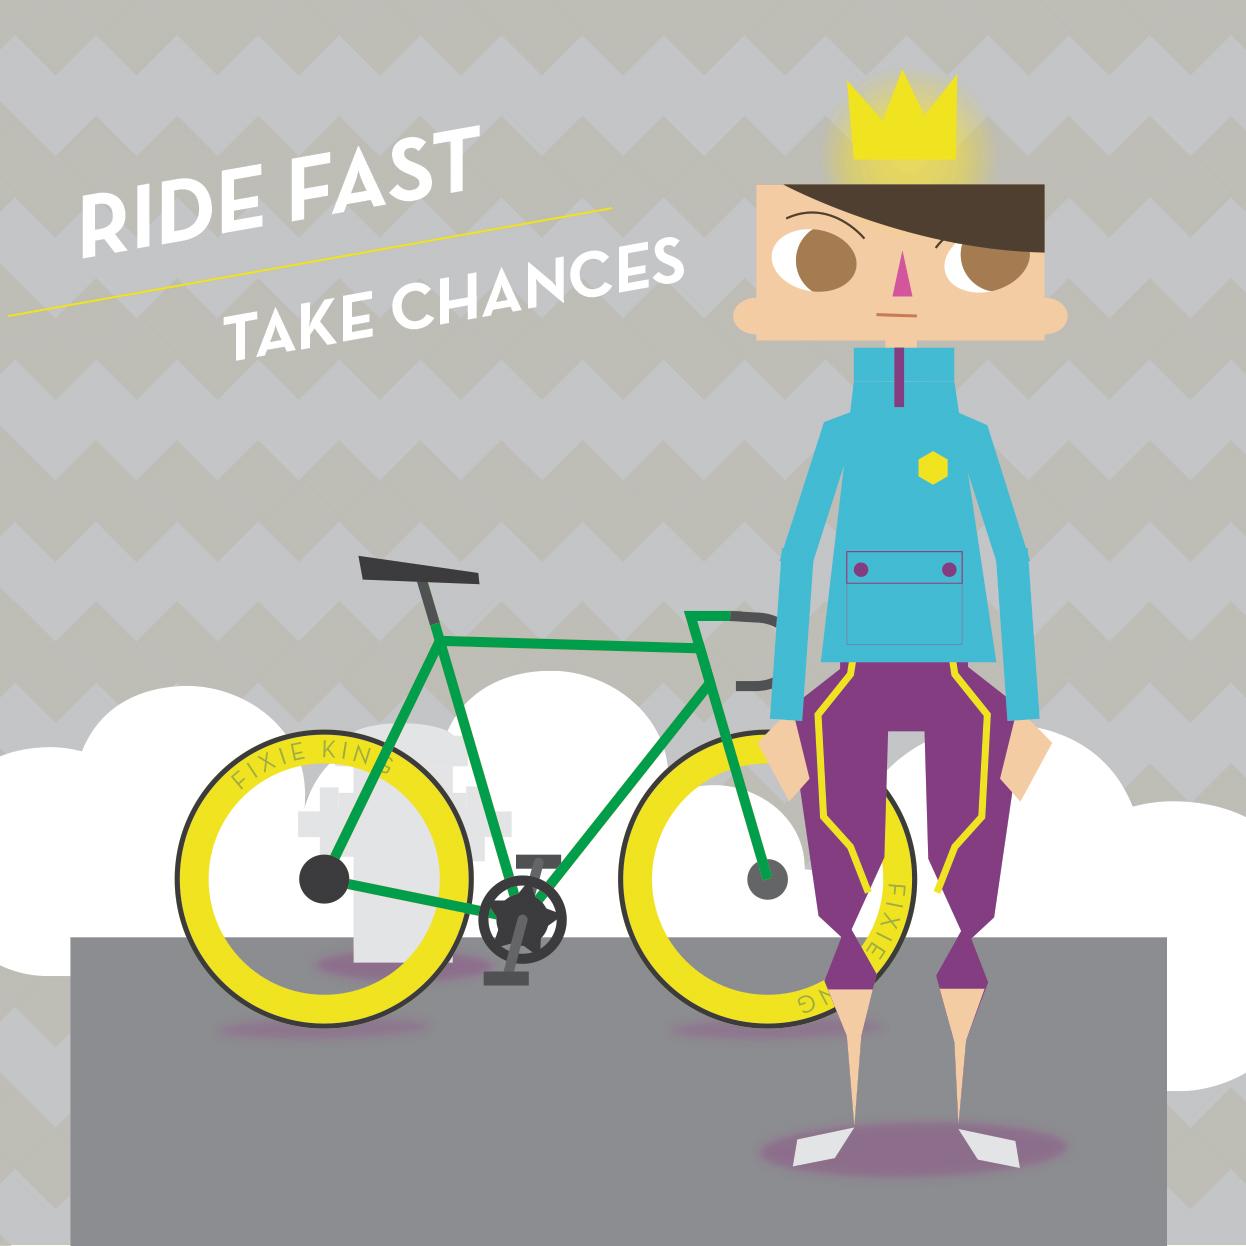 ride_fast0101